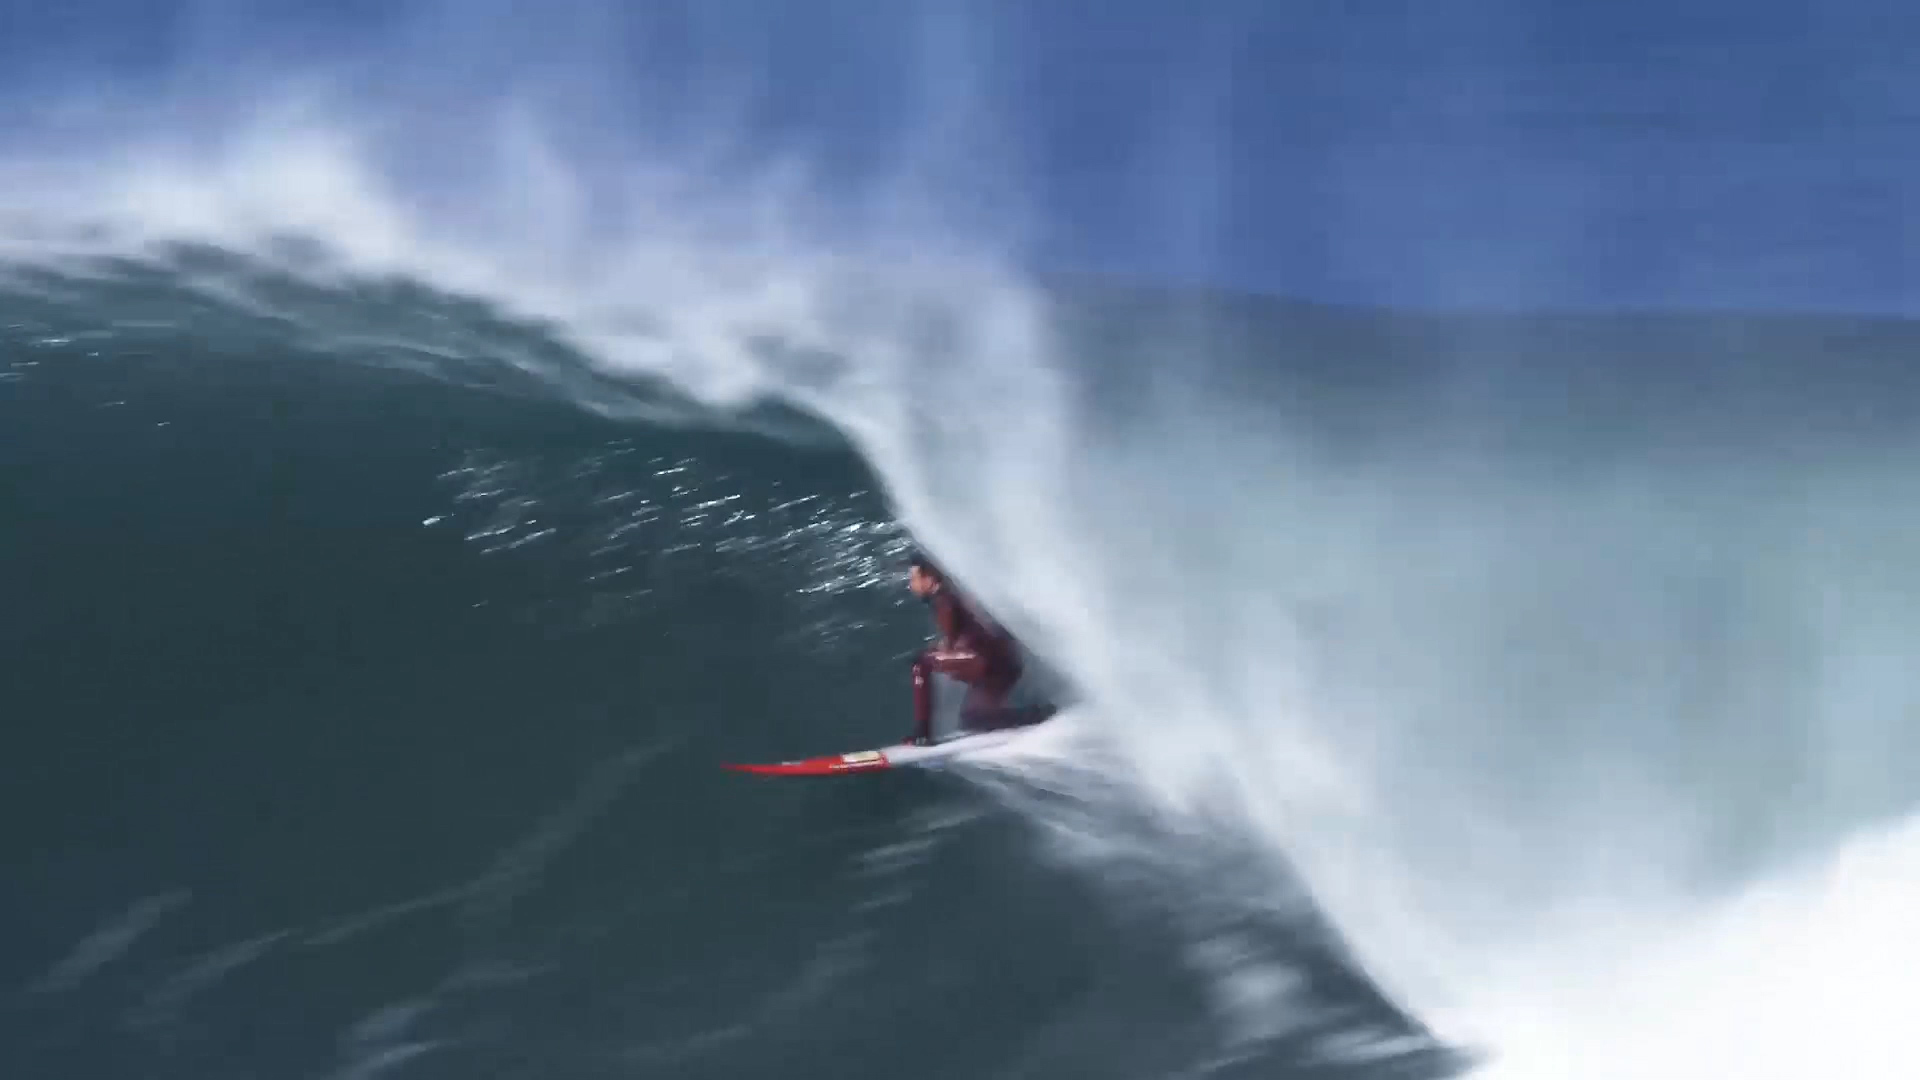 Big Wave in the Basque Country Ingles, with Laurels. Azkena Carrascon.MP4.Imagen fija015.jpg